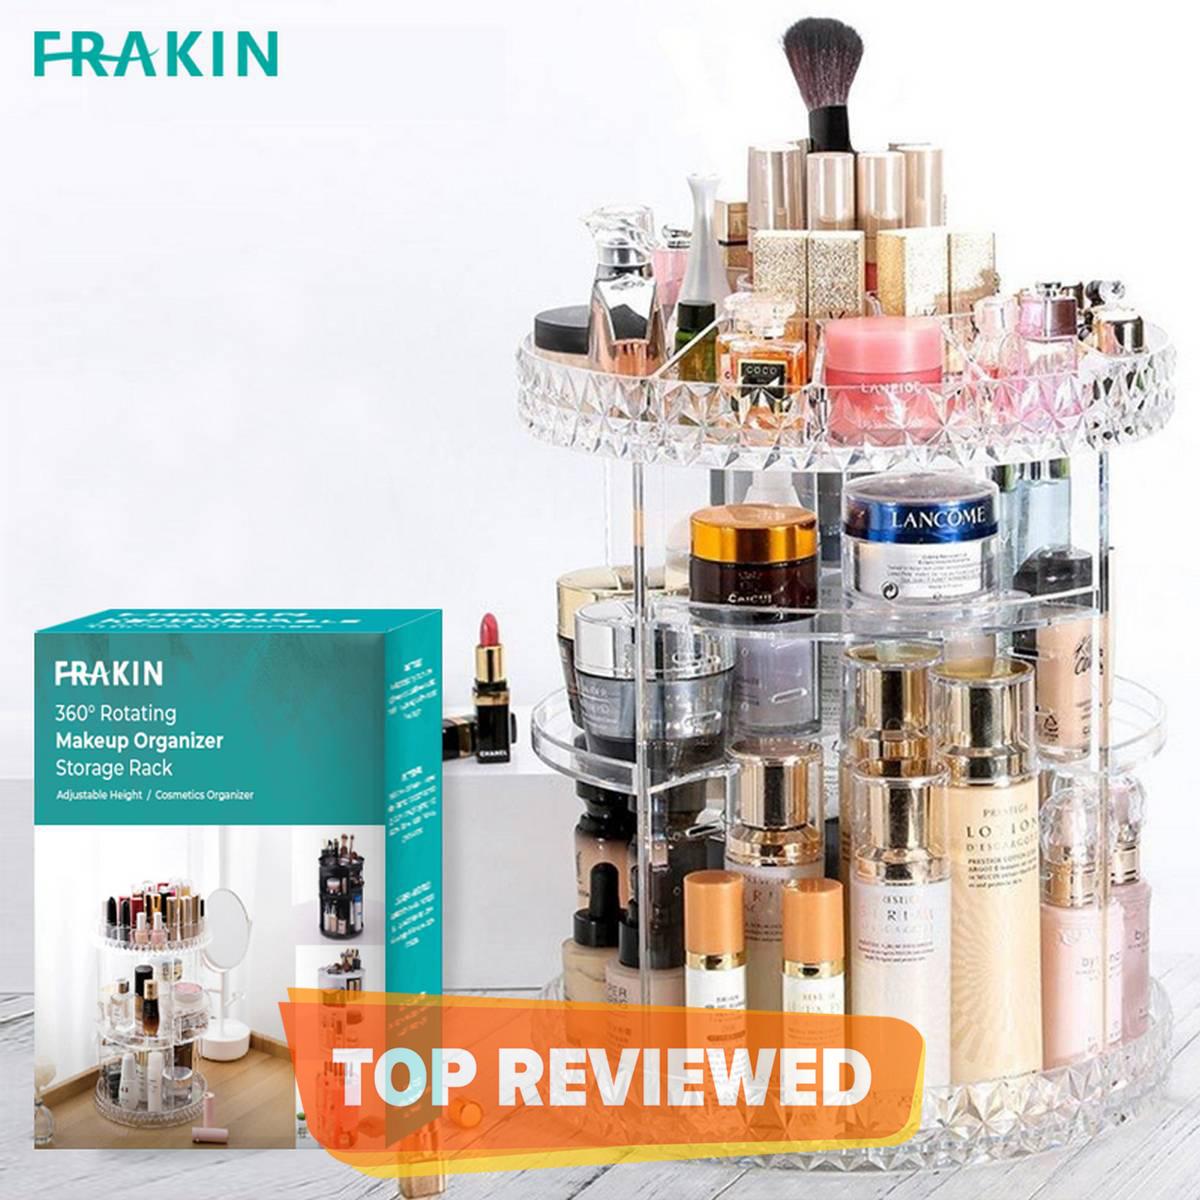 FRAKIN 360 Degree Rotating Makeup Storage Rack Height Adjustable Cosmetics Organizer Assembly Skin Care Holder Bathroom Display Case